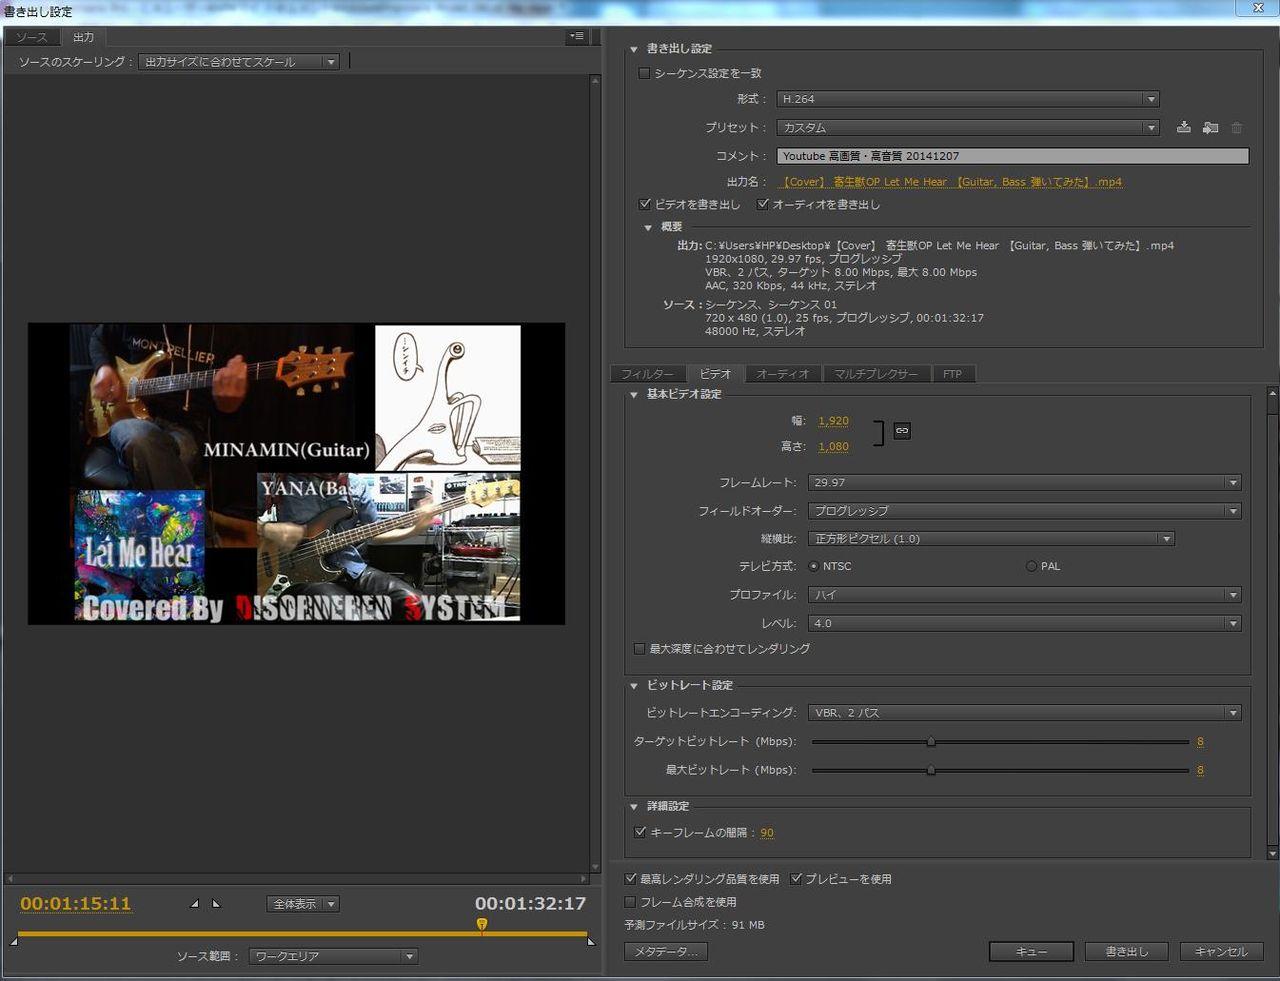 【AviUtl】Youtube用の高画質・高音質な動画を作る方法【x guiEx】 | AviUtlの易しい使い方